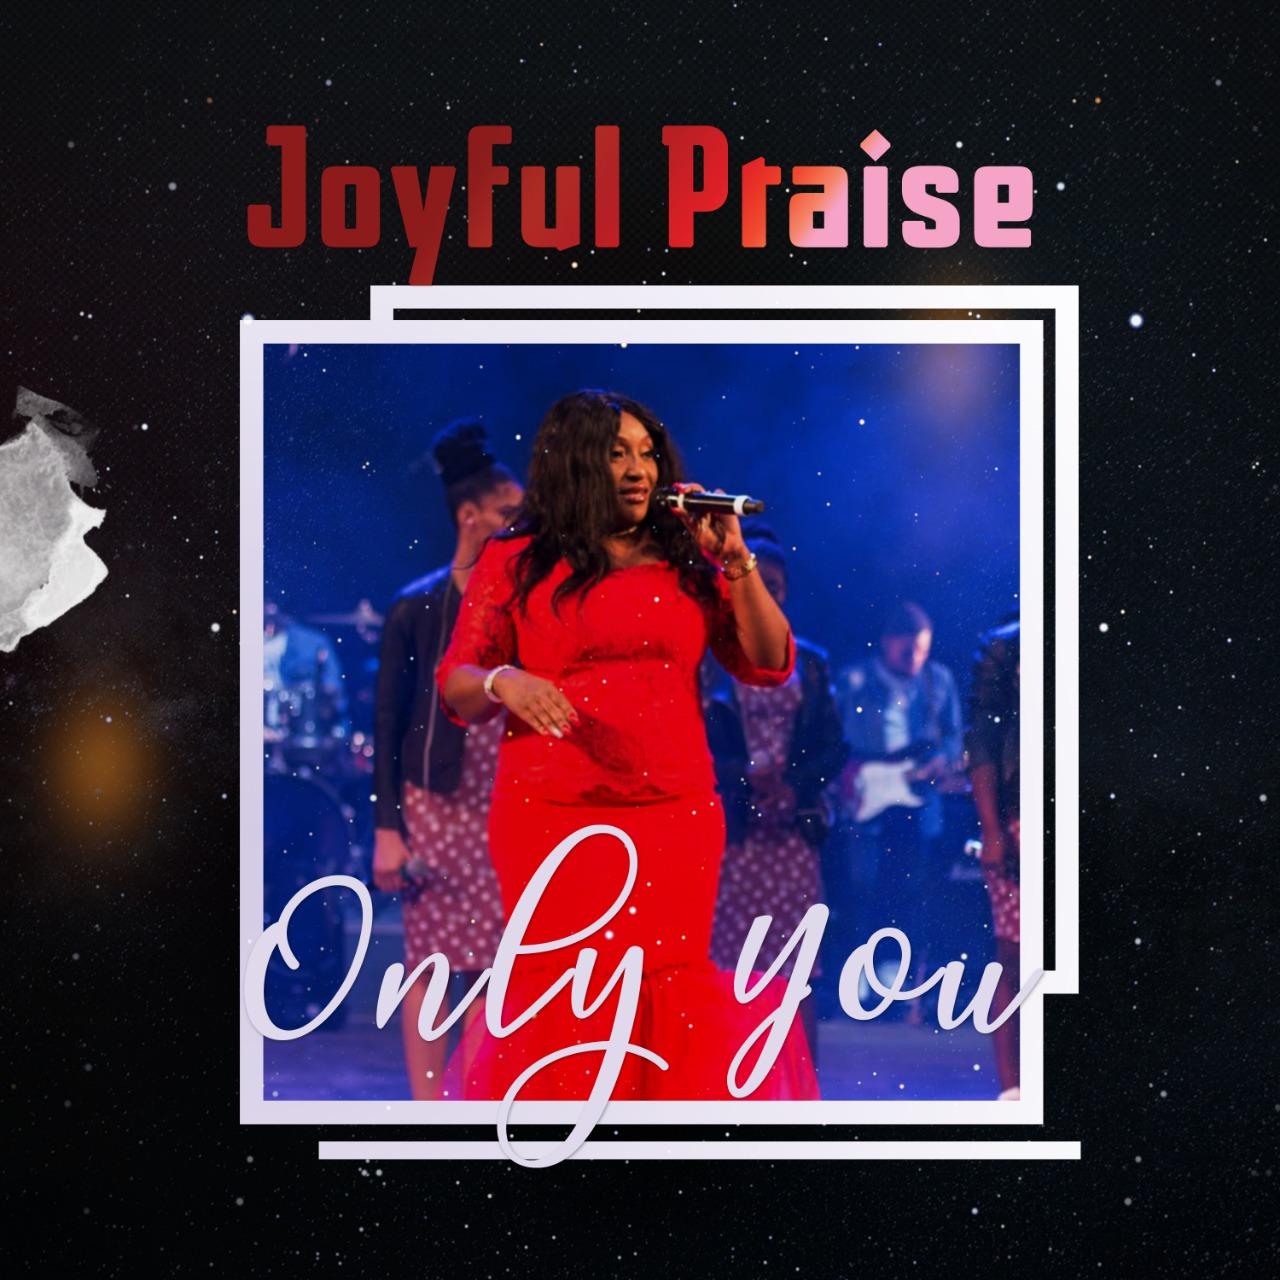 Video Joyful Praise - Only You